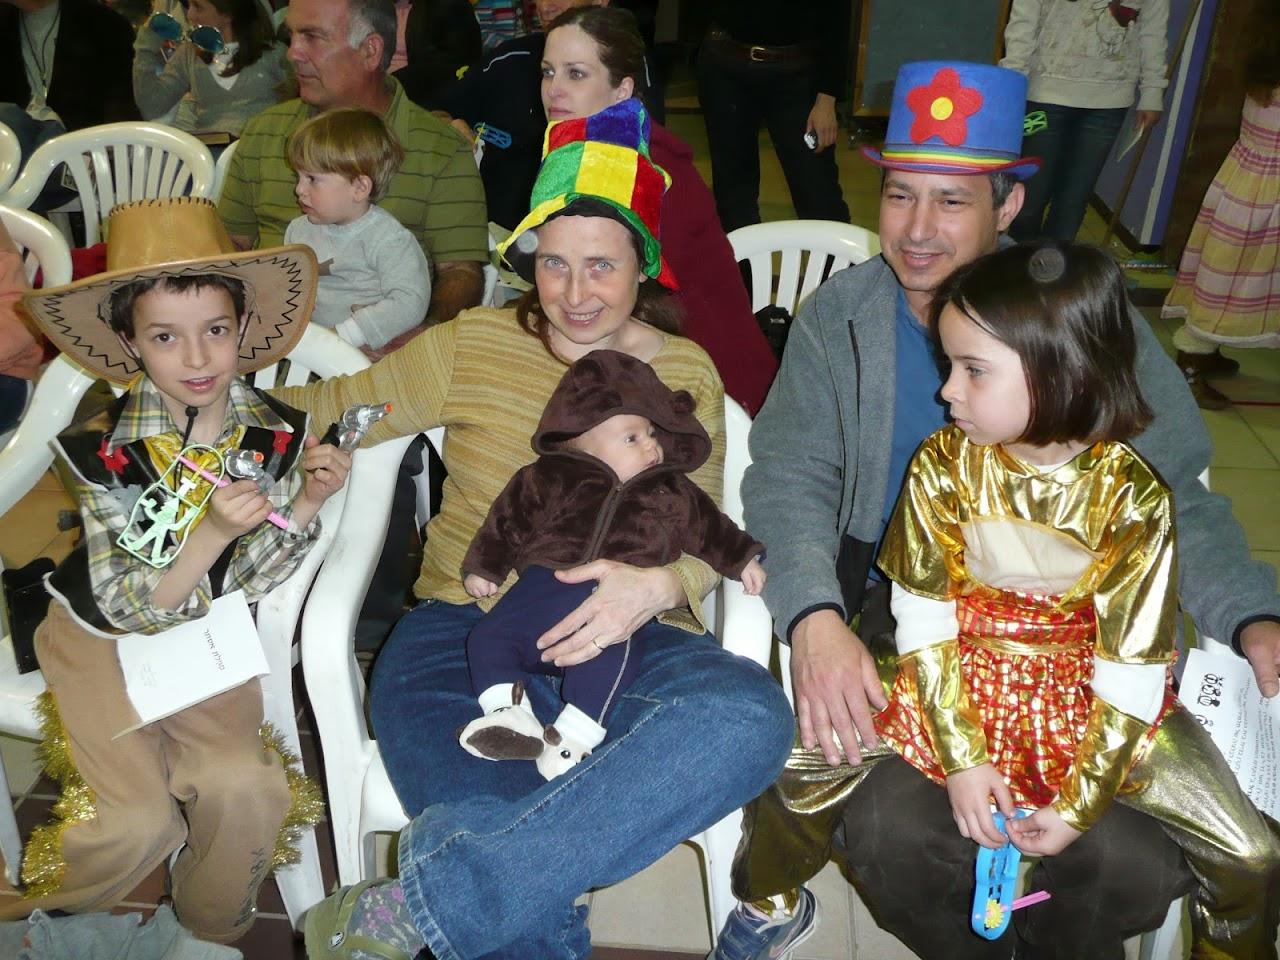 Purim 2008  - 2008-03-20 18.39.29-1.jpg